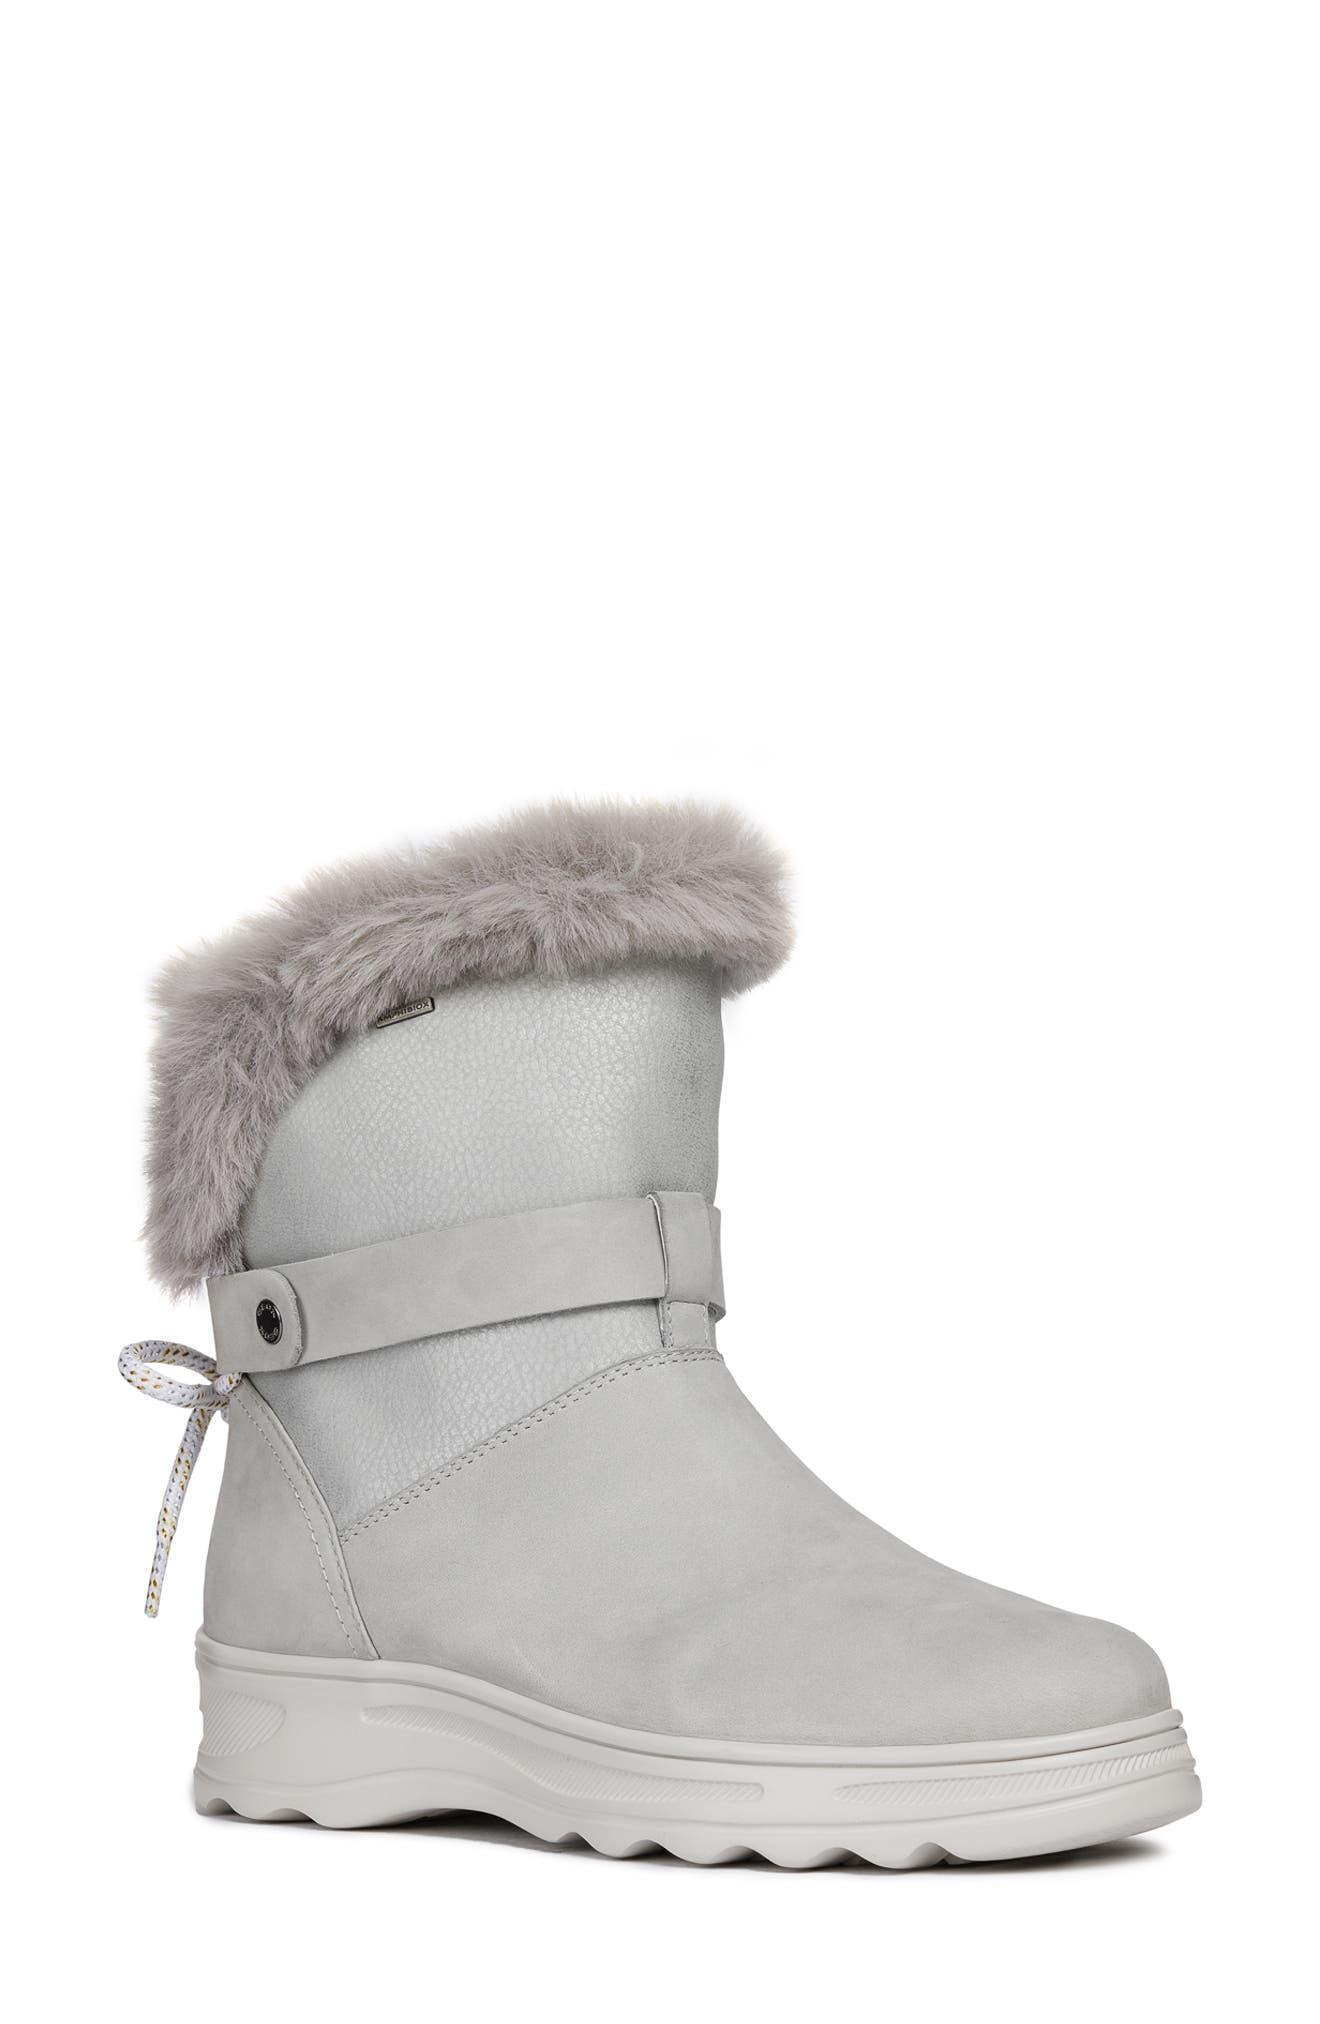 GEOX Hosmos Abx Waterproof Faux Fur Trim Boot in Light Grey/ Silver Suede